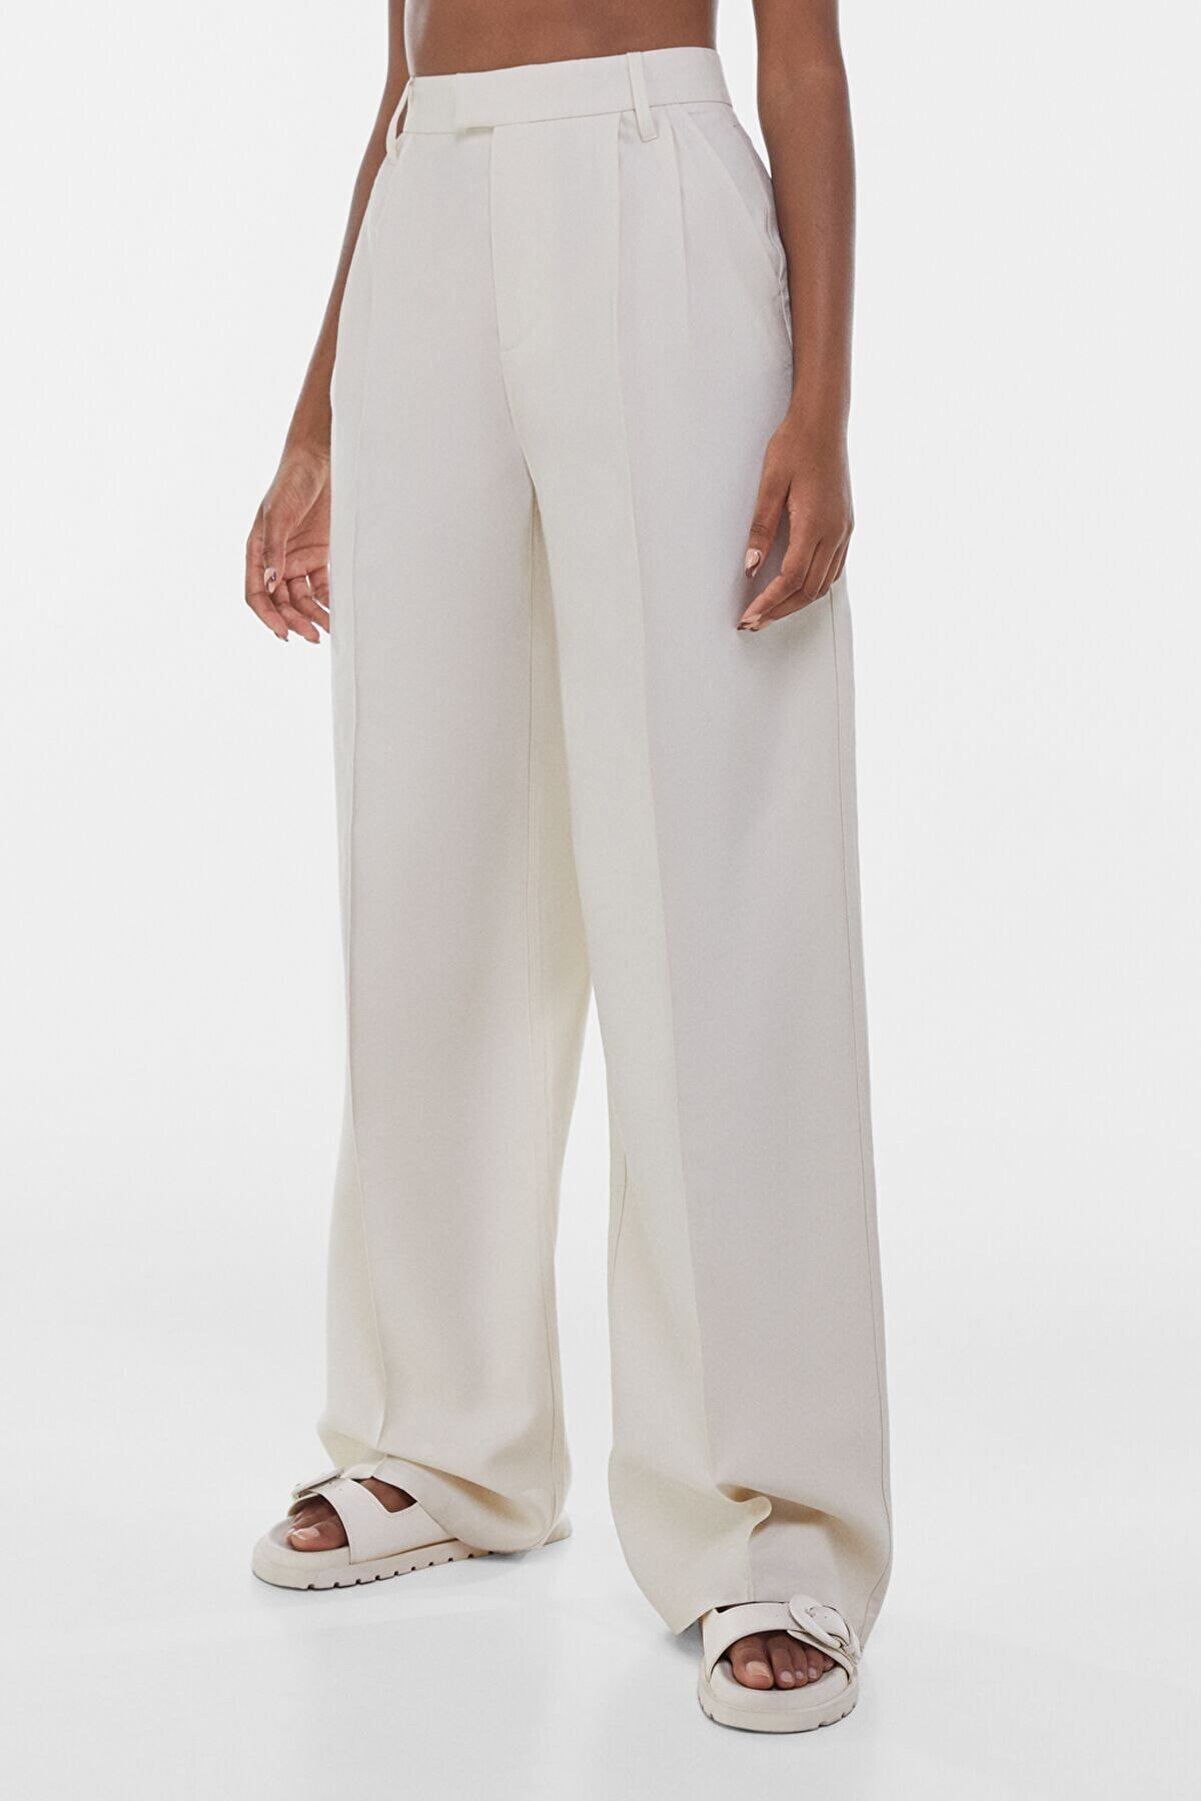 Bershka Kadın Bej Wide Leg Pantolon